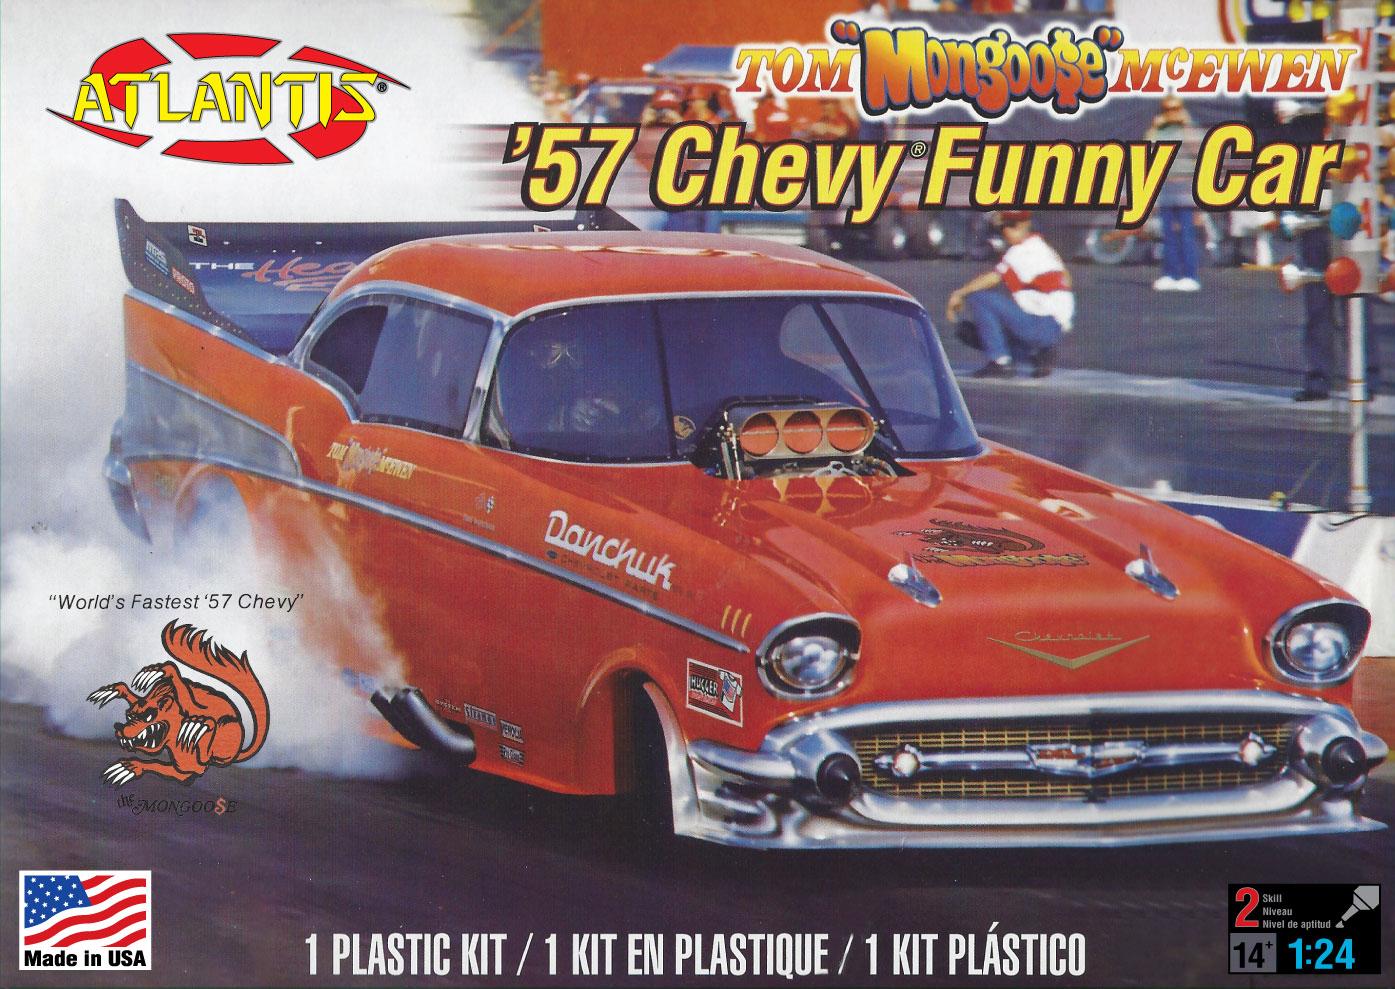 Atlantis 1/24 Tom McEwen '57 Chevy Funny Car